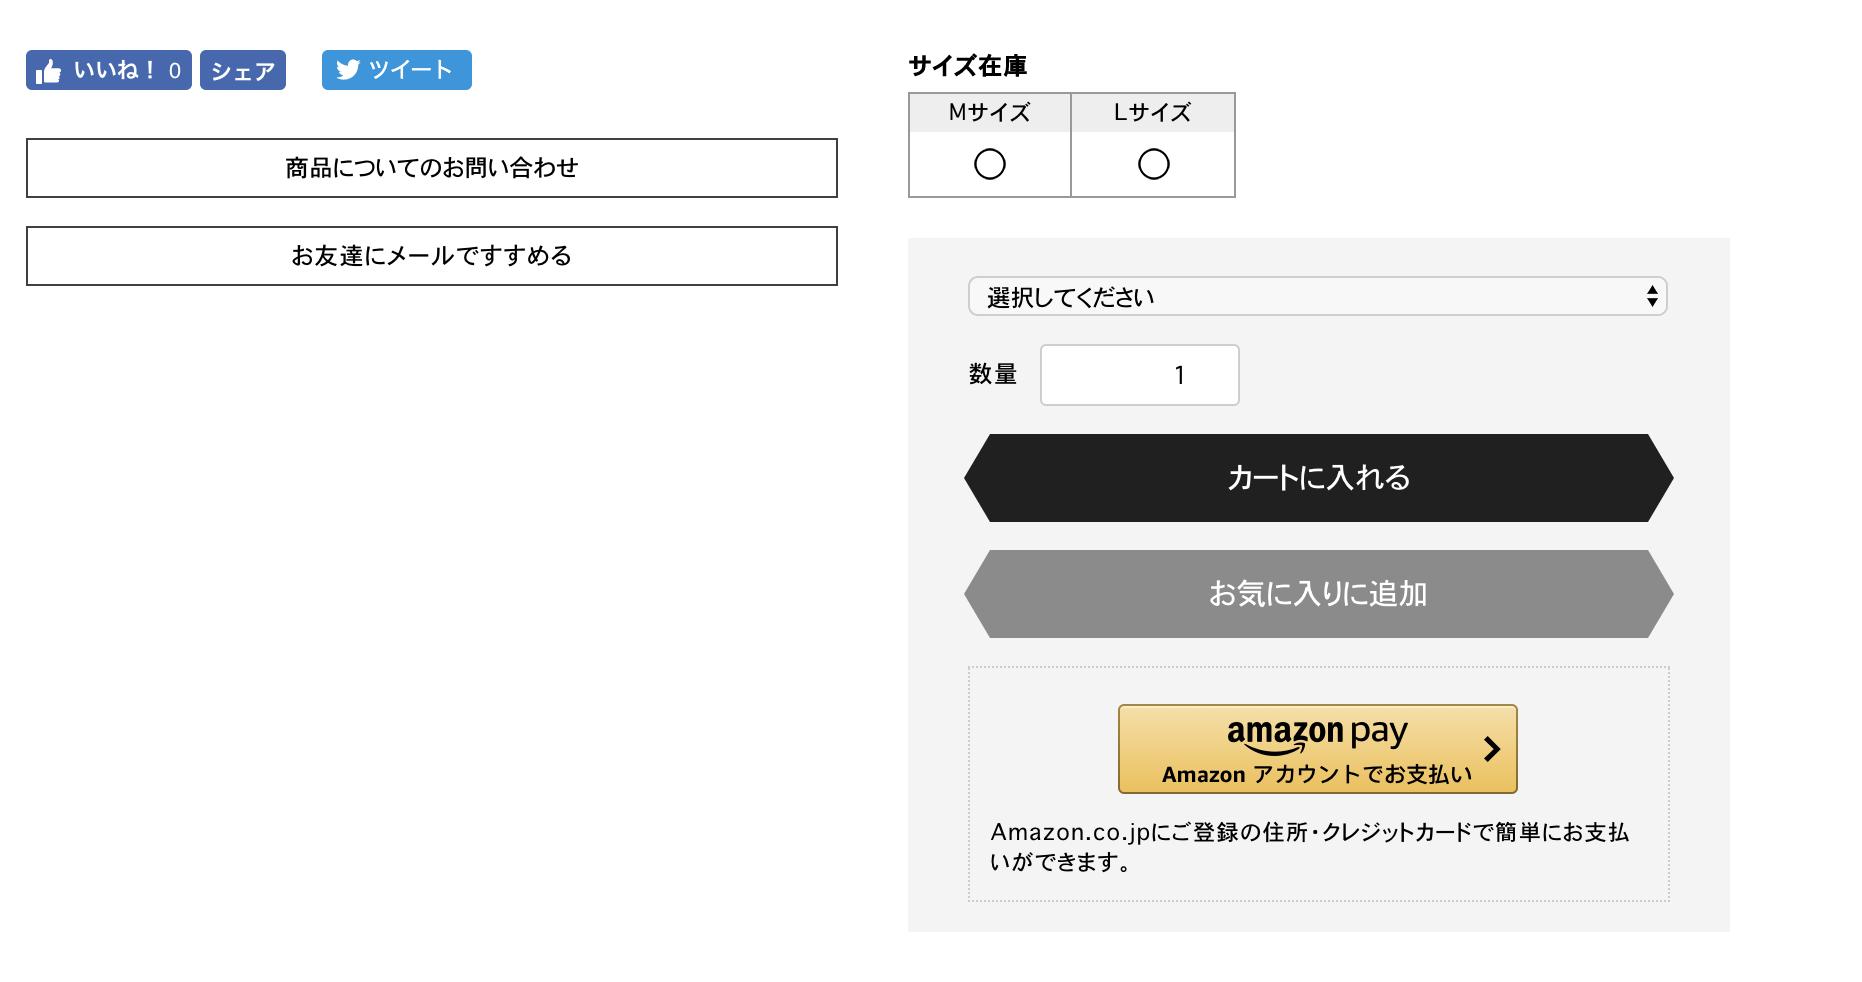 Eva Store Kaoru t-shirt product page end